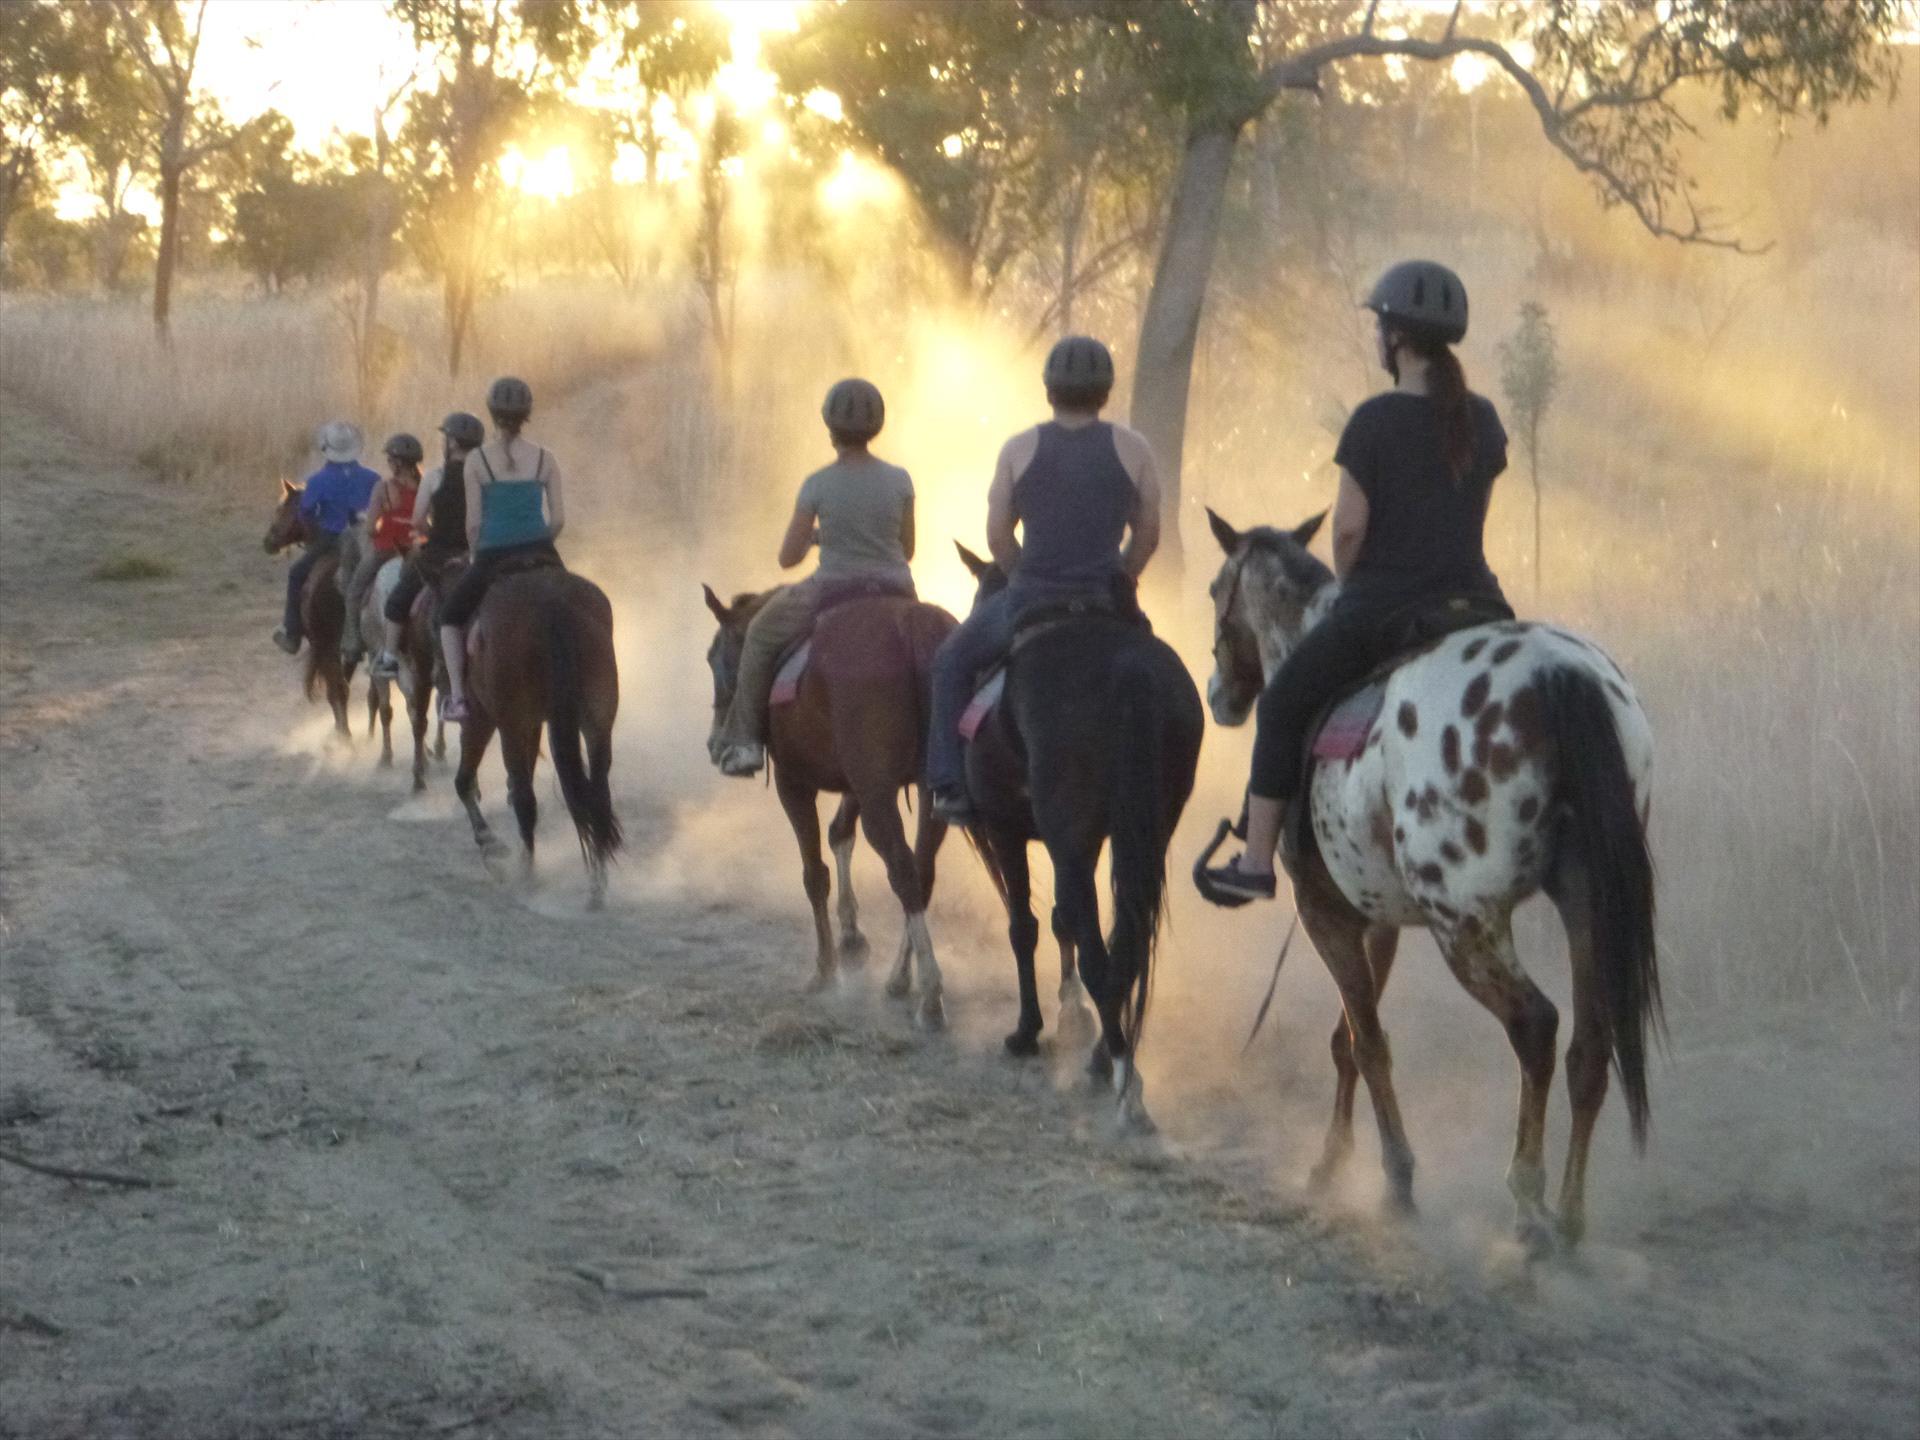 Yeehaa Trail Rides